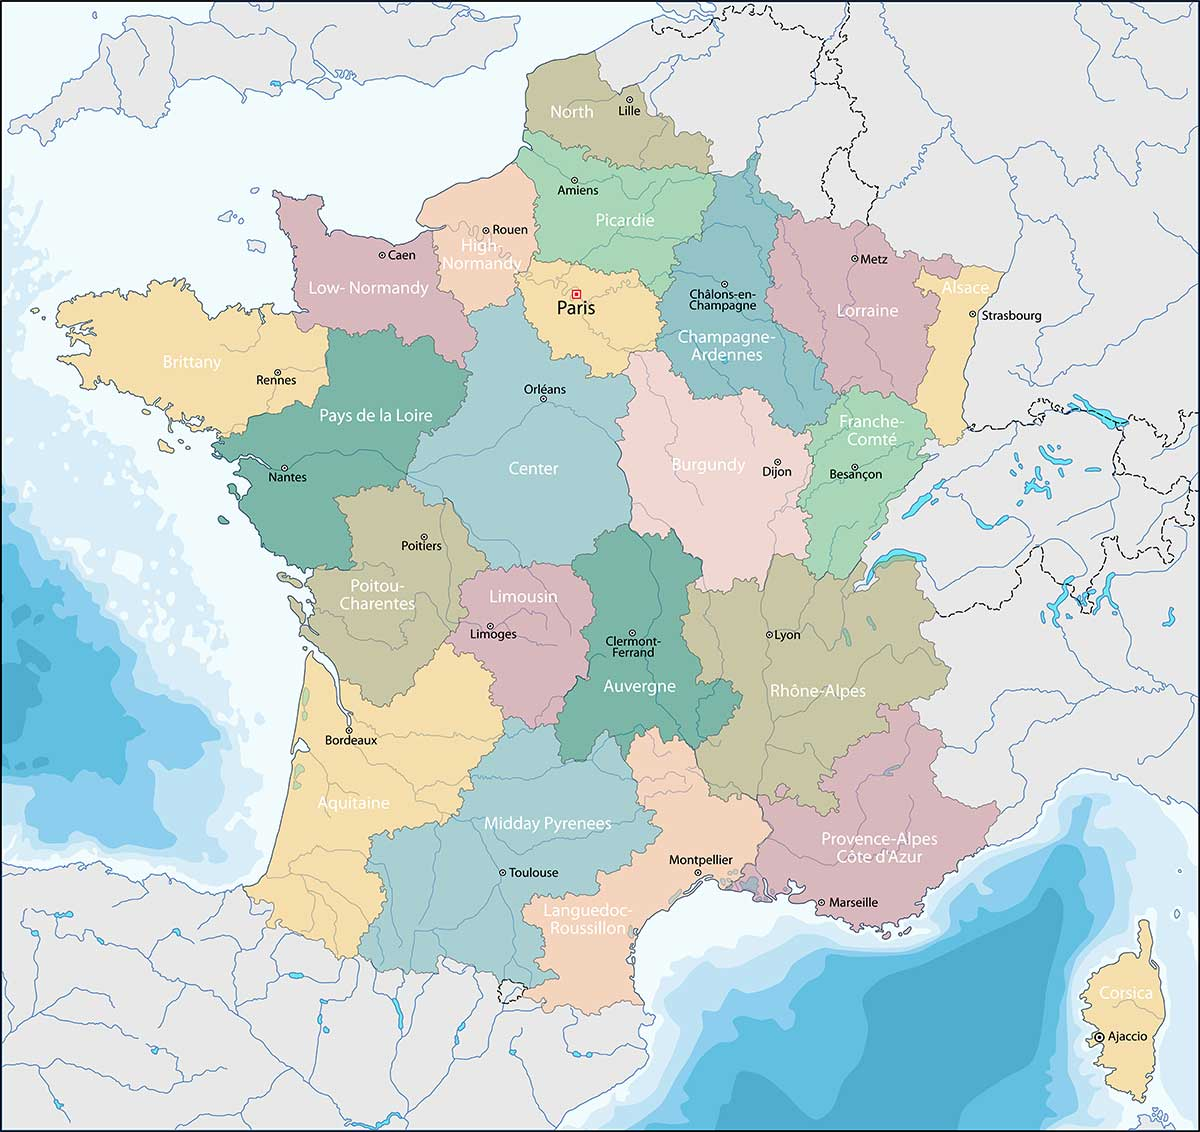 Cartina Politica Di Parigi.Cartina Della Francia Scarica Cartina Della Francia In Alta Qualita Dati Da Europa